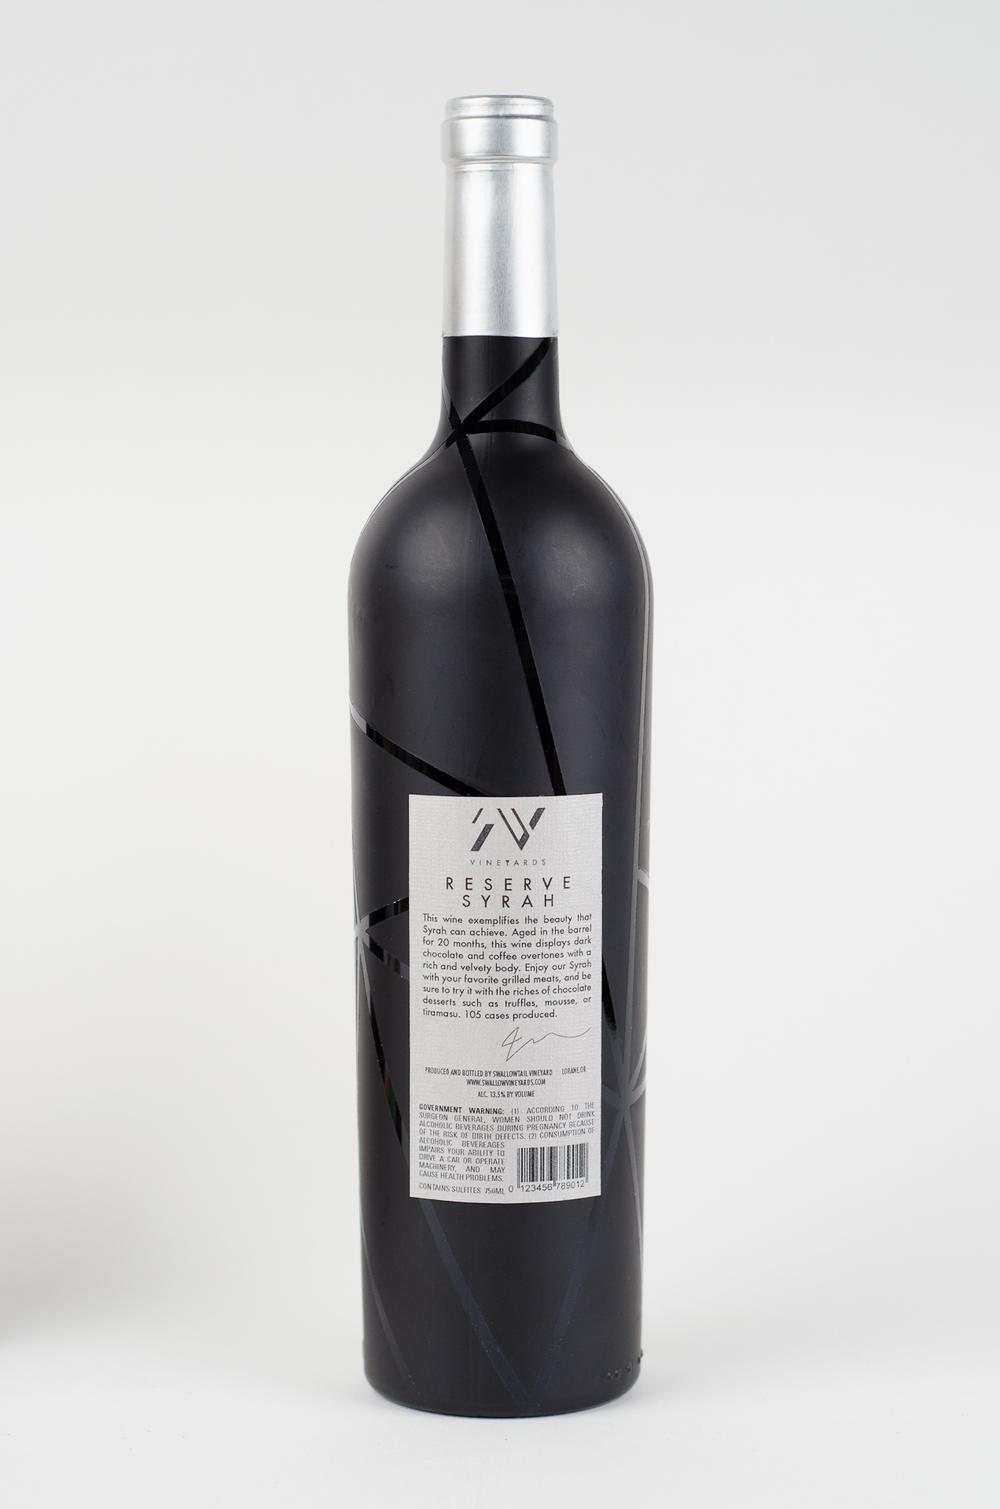 Brcic_Swallowtail_Wine_Design-13.jpg